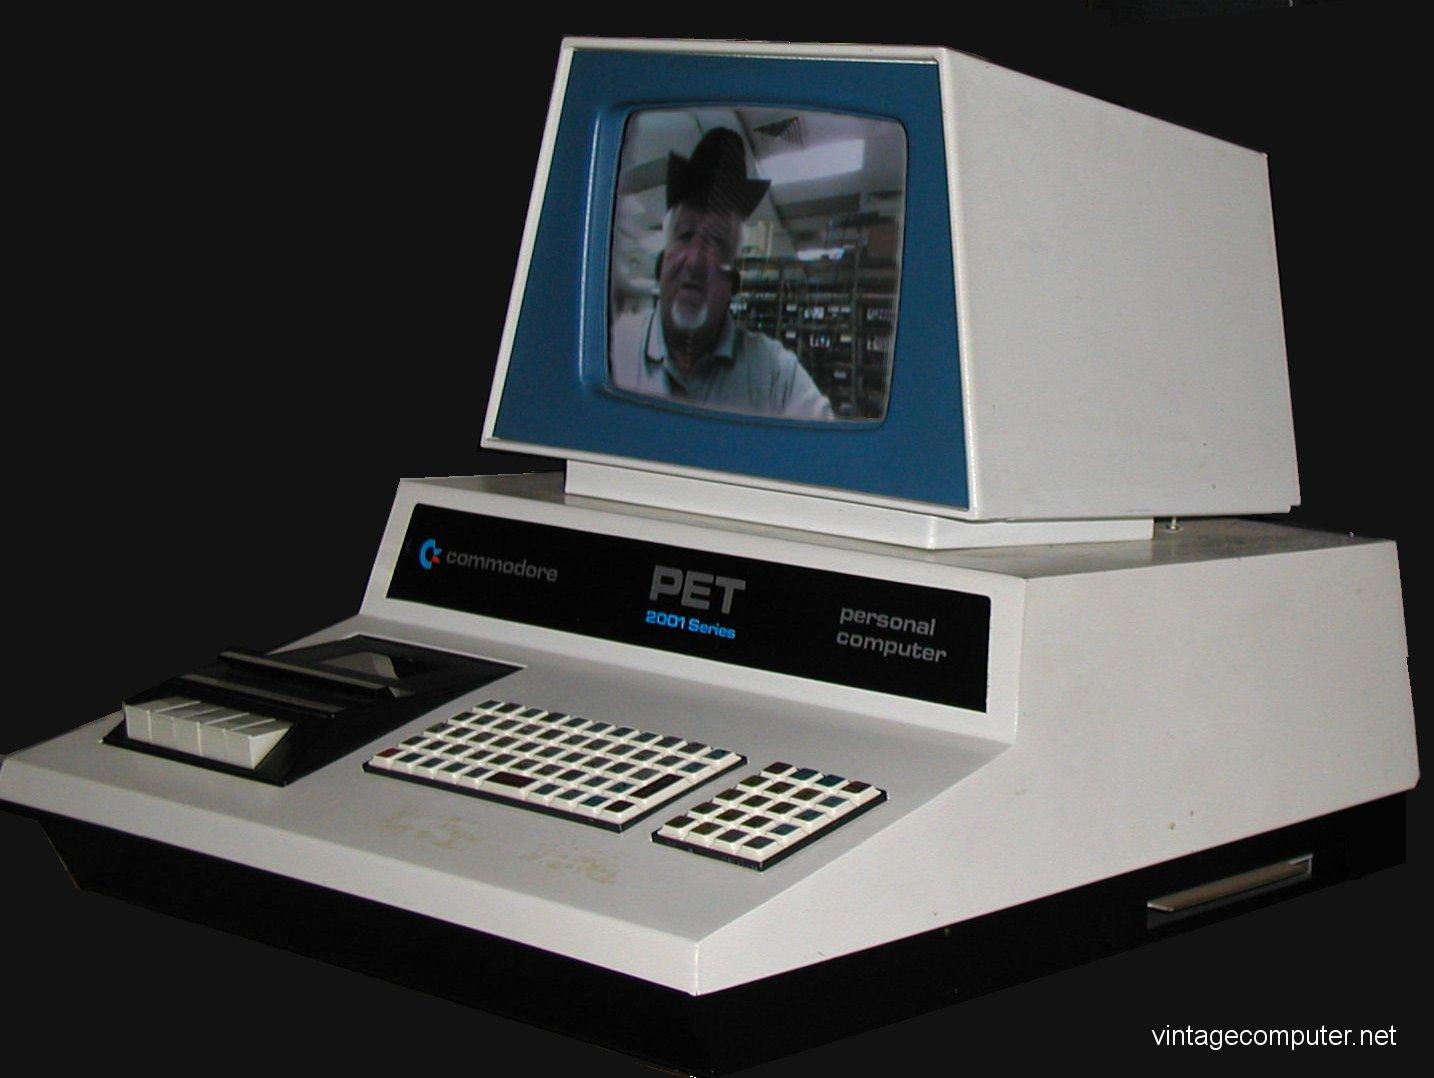 VintageComputer.net - Commodore PET 30th Anniversary |